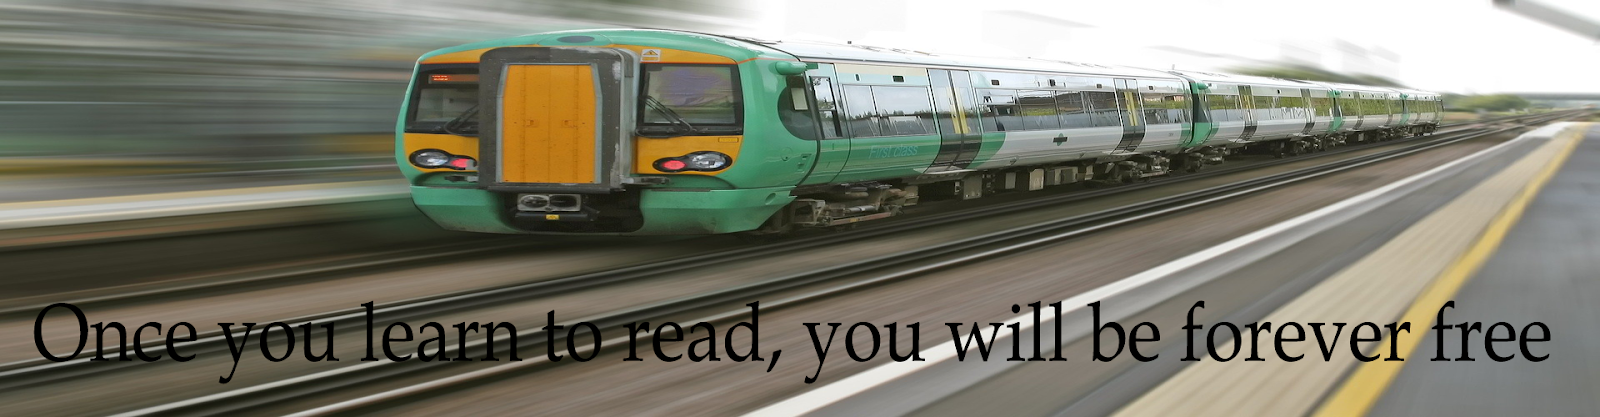 Commuter Books